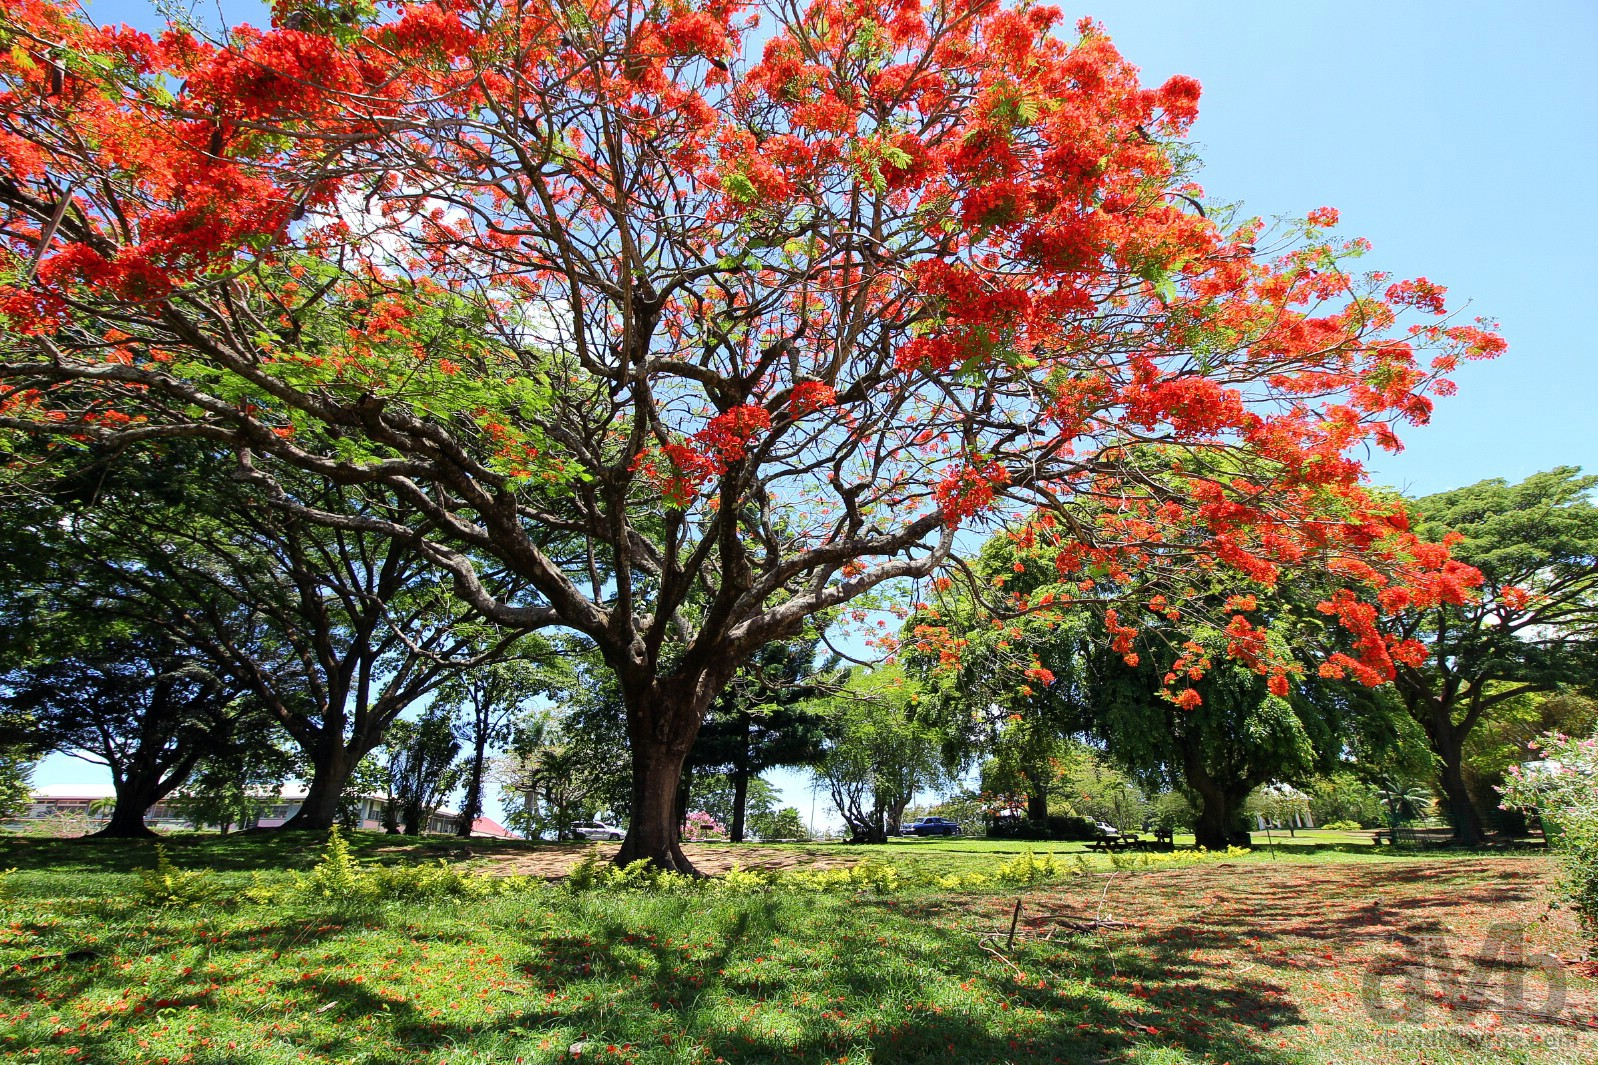 Dominica Botanical Gardens, Roseau, Dominica, Lesser Antilles. June 10, 2015.